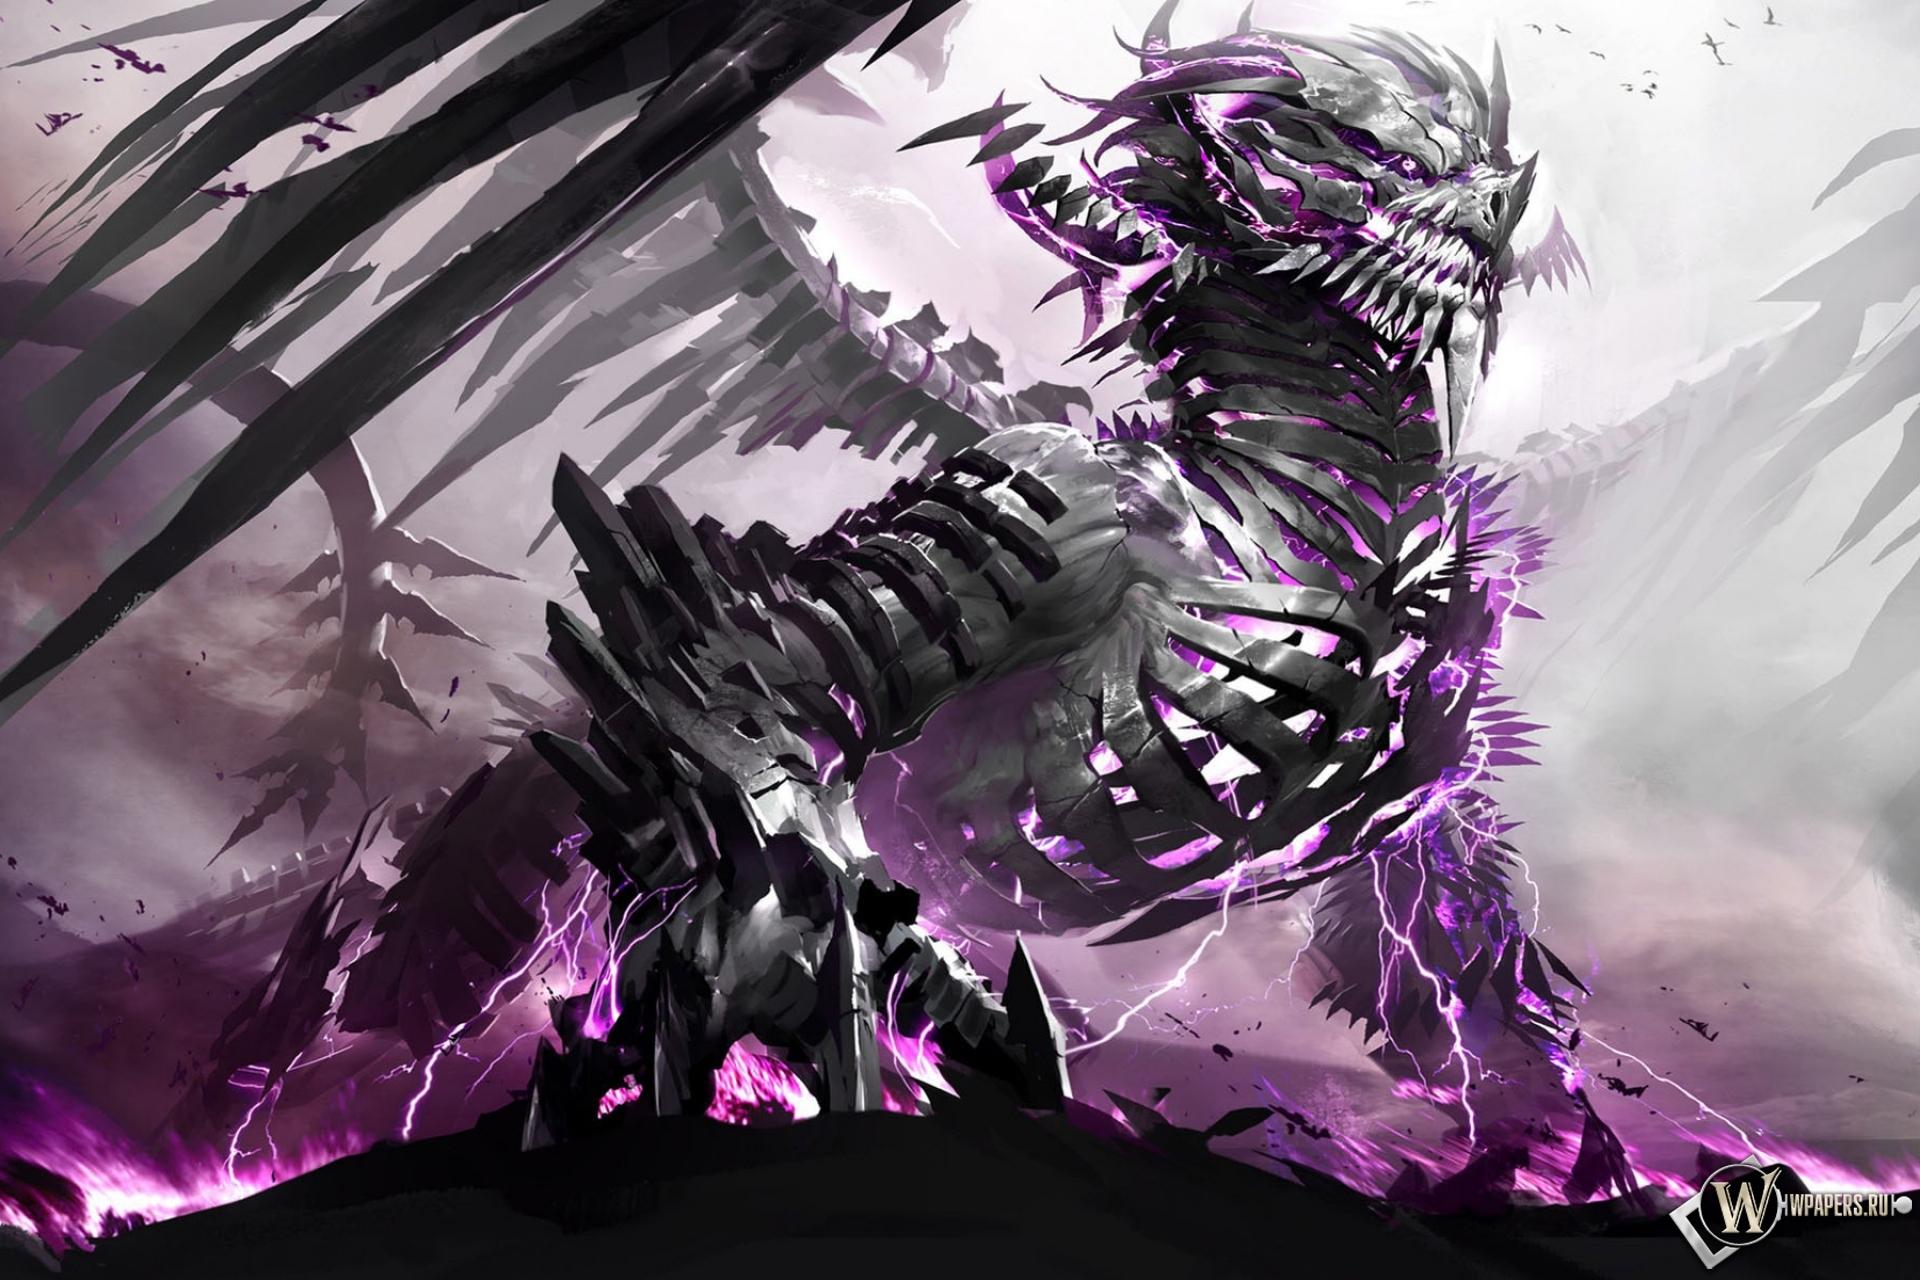 дракон на рабочий стол картинки